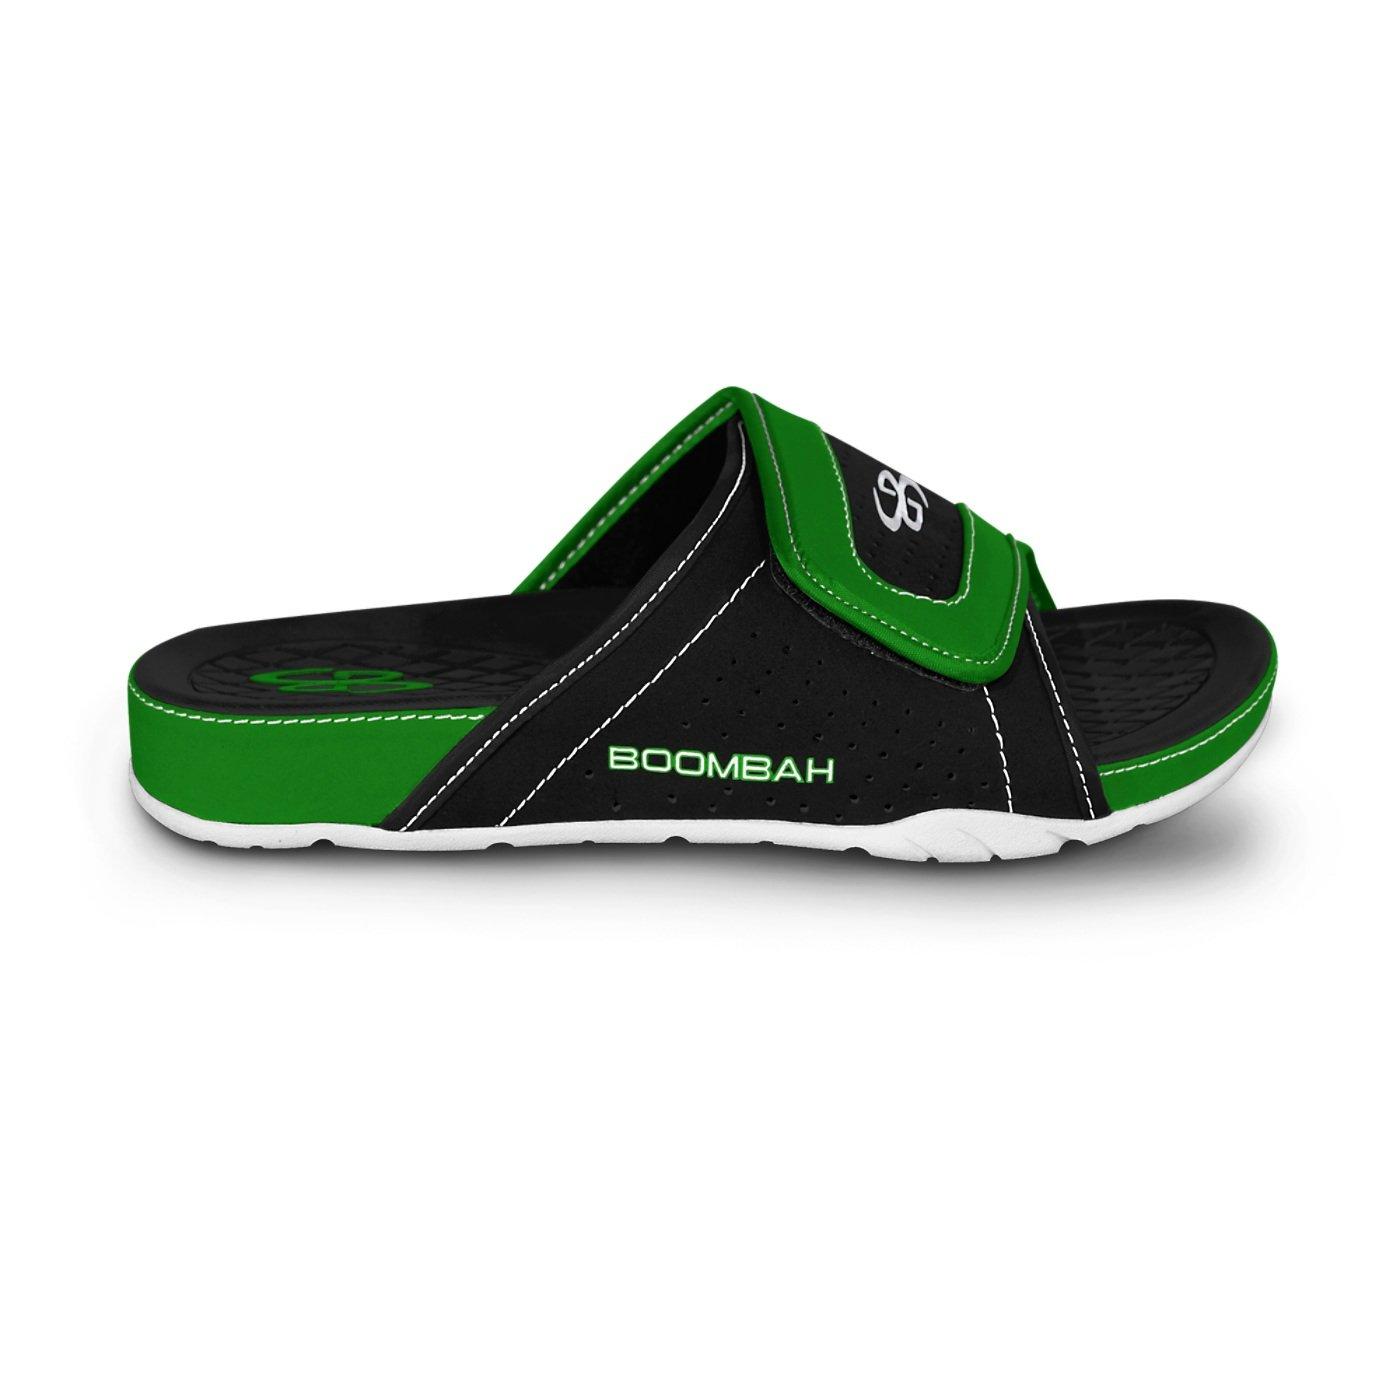 Boombah Men's Tyrant Slide Sandals - 32 Color Options - Multiple Sizes B077NLXHDK 6|Black/Kelly Green